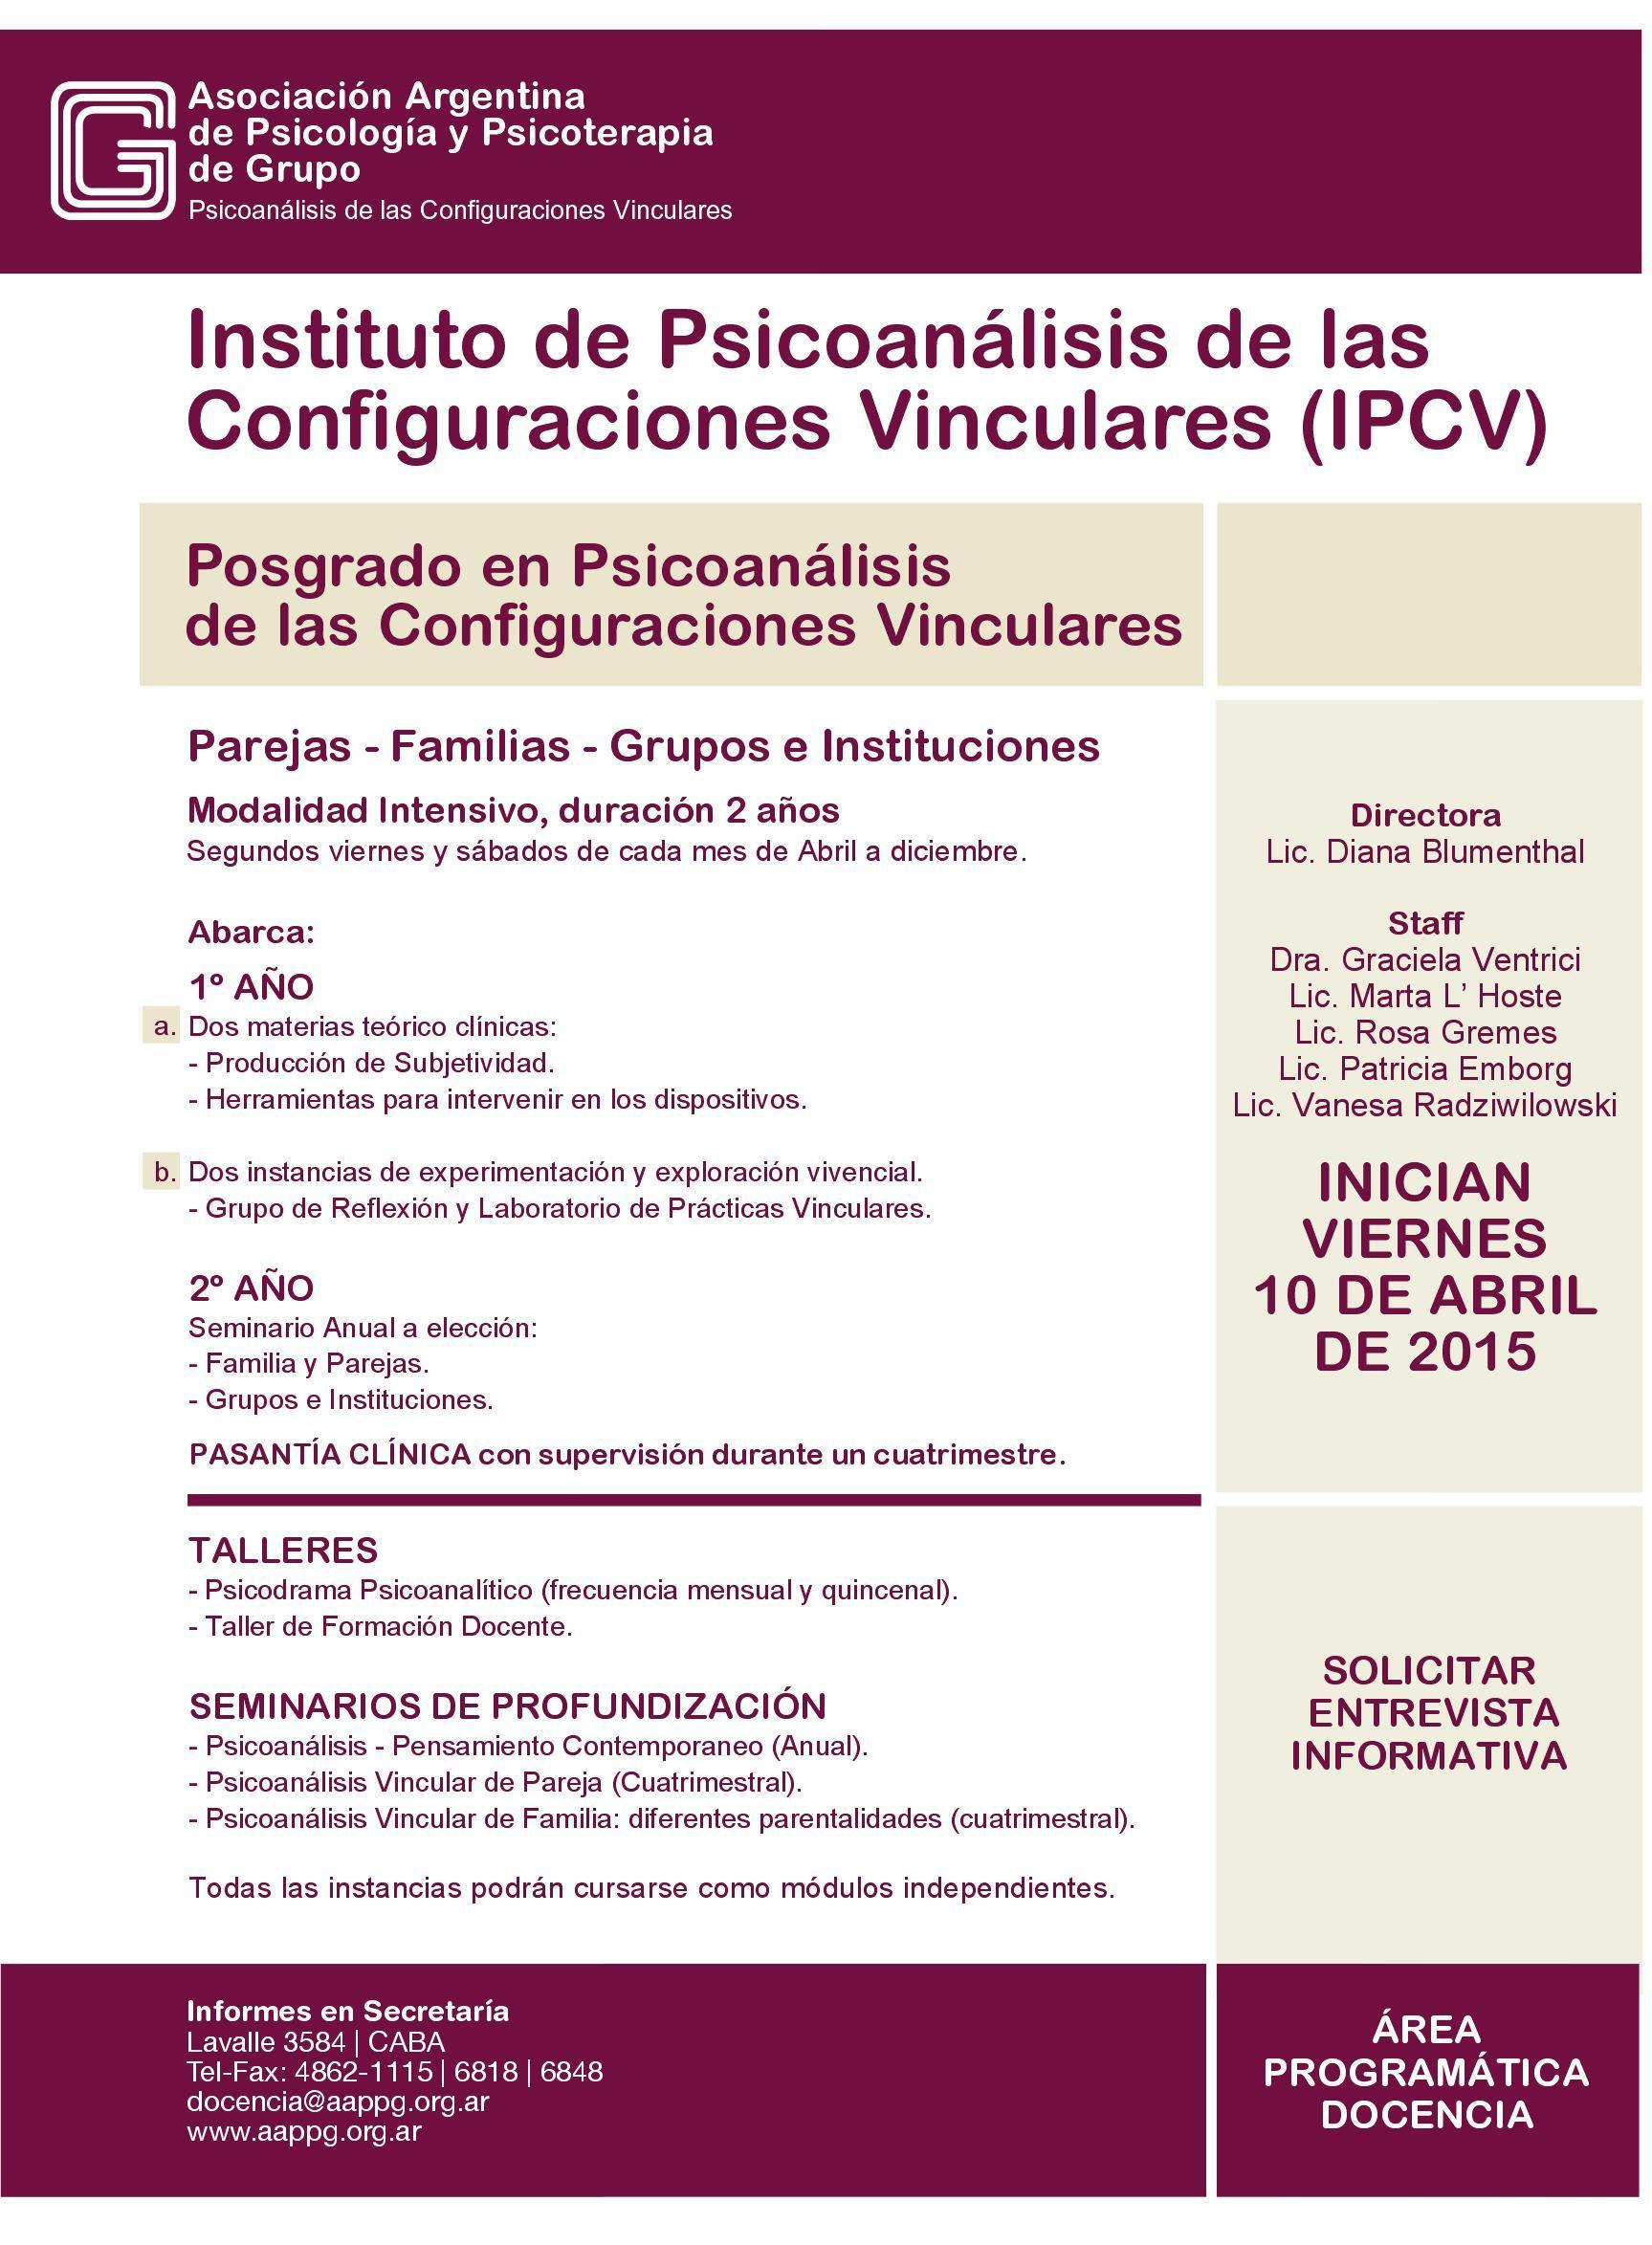 IPCV2015